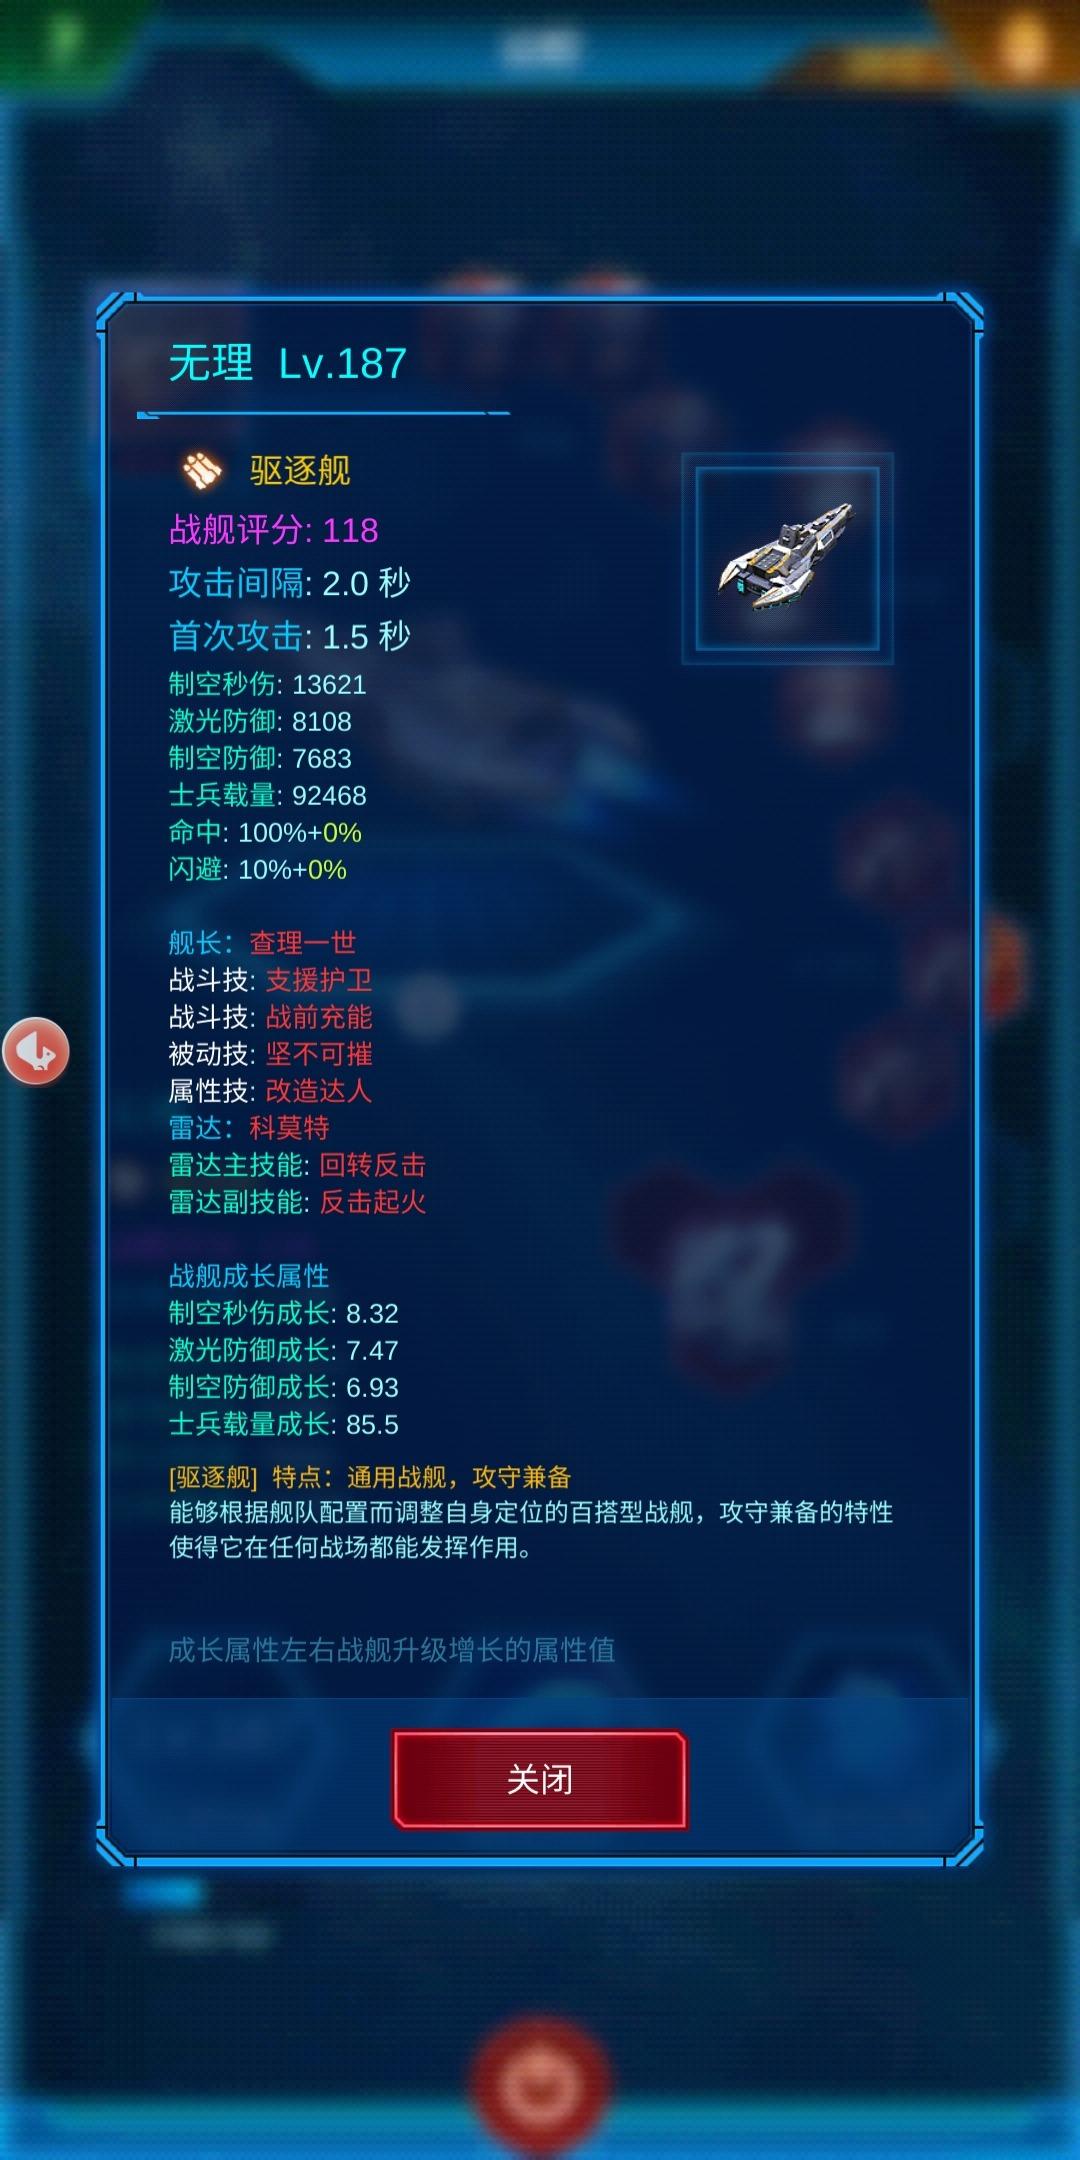 Screenshot_2020-02-05-17-43-52-153_com.ttnna.mobile.xjzjzk.jpg